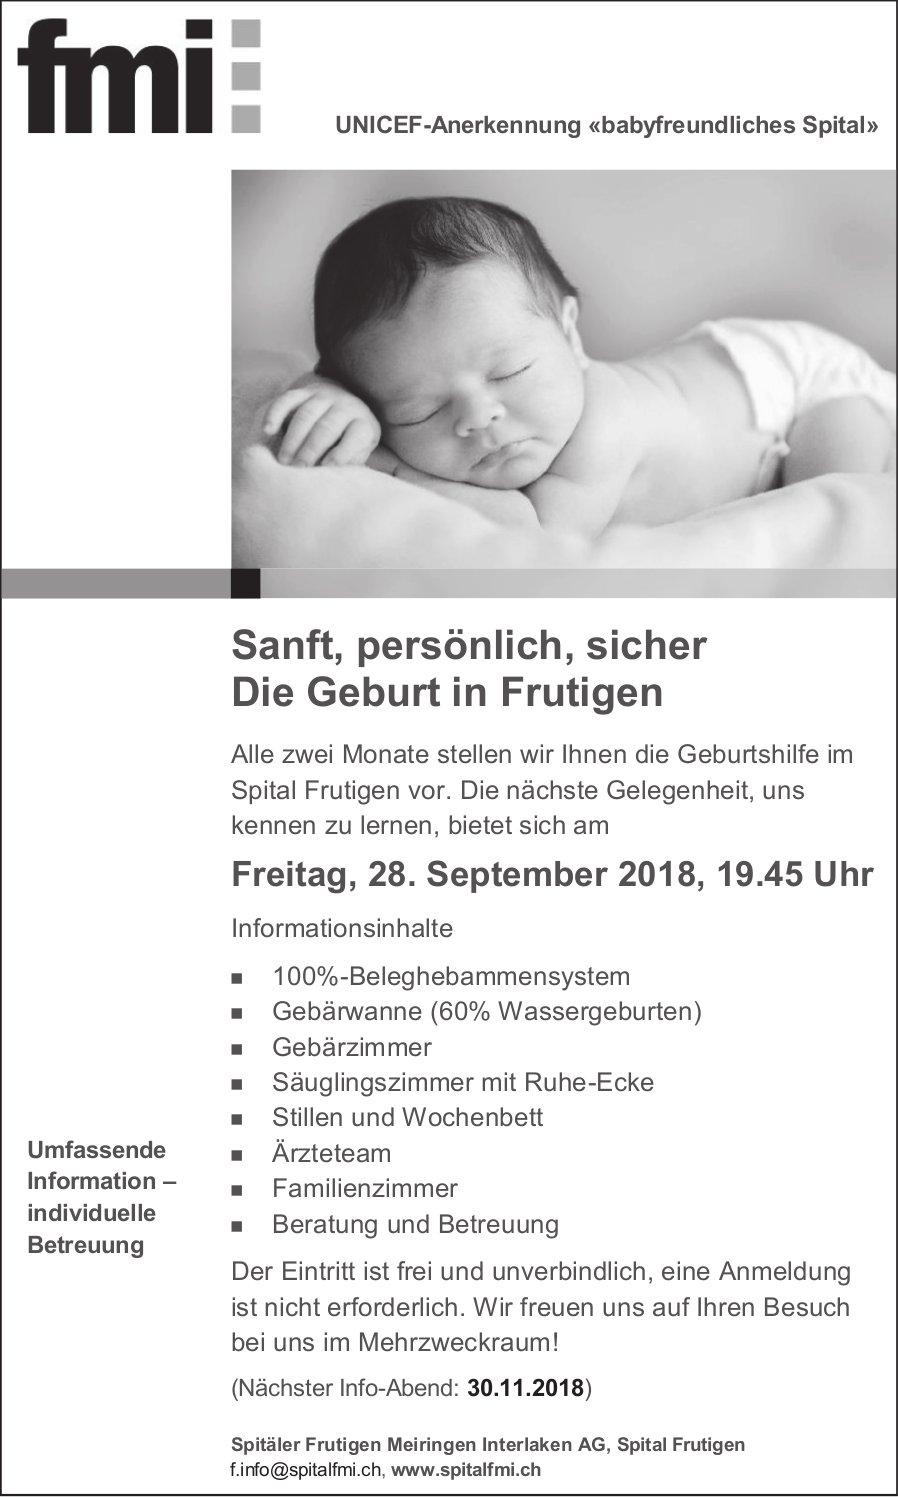 Die Geburt in Frutigen, Infoabend, 28. September